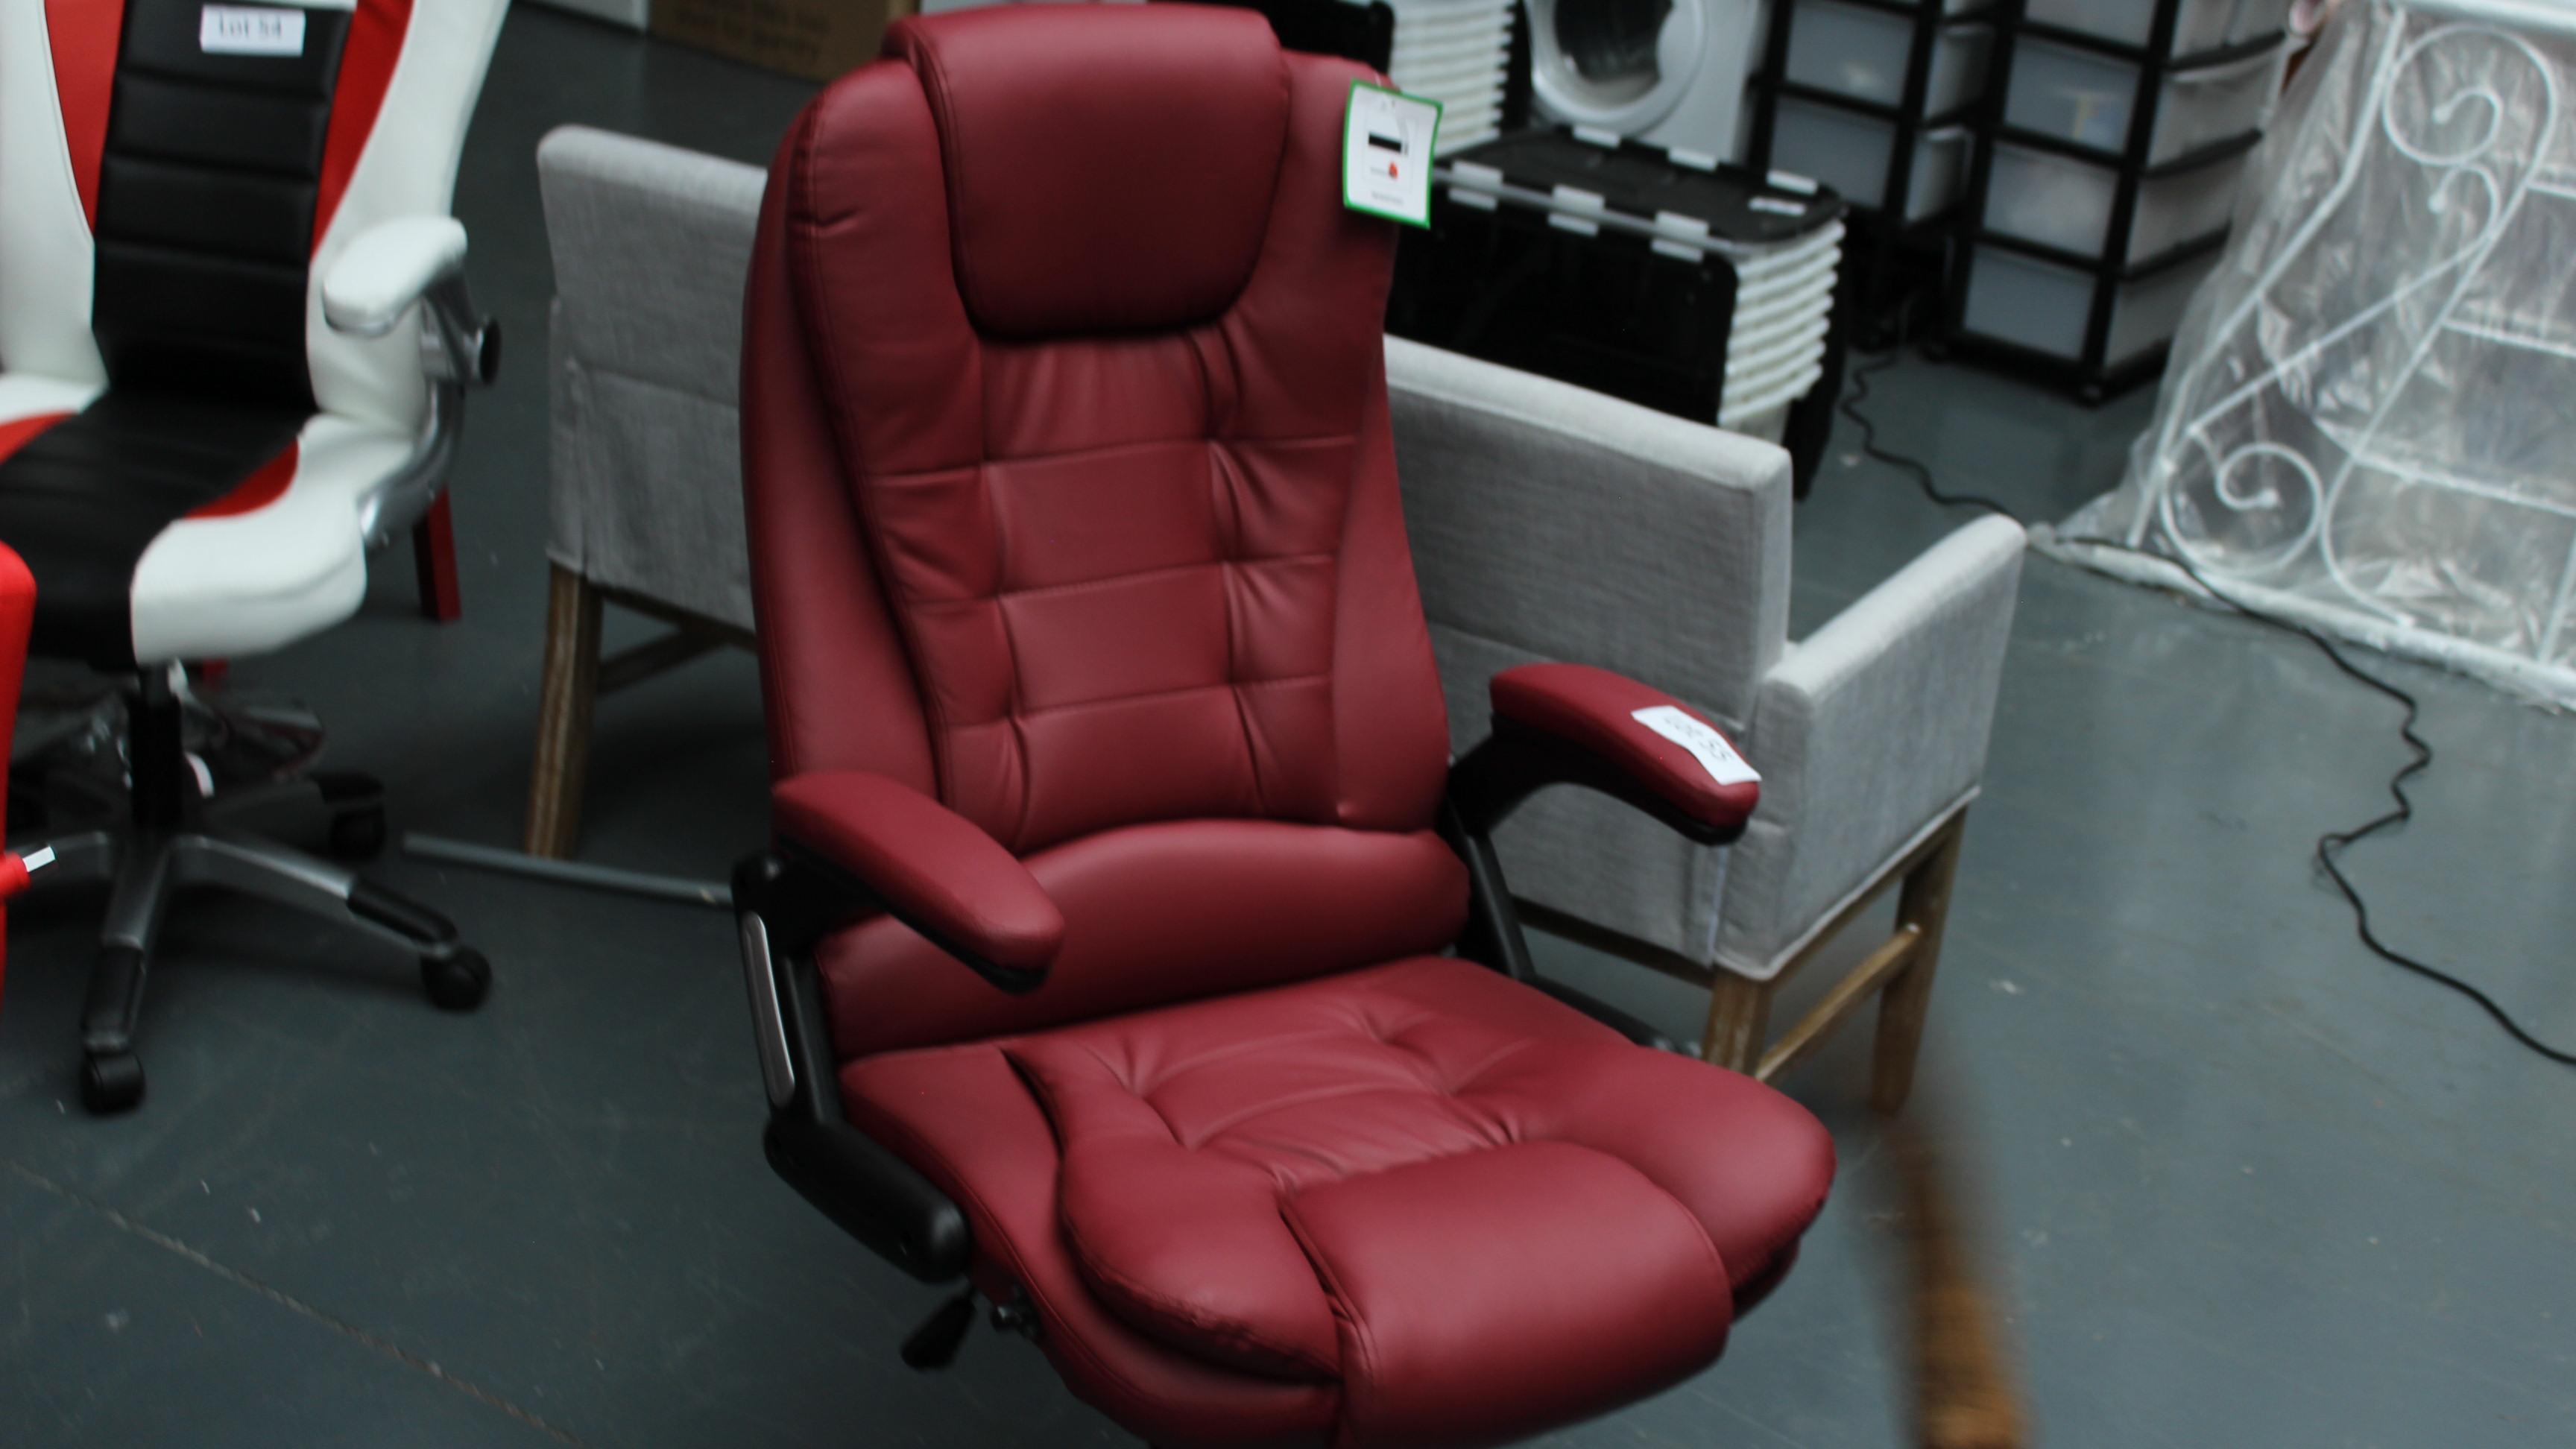 Lot 55 - Executive Chair Burgundy. New